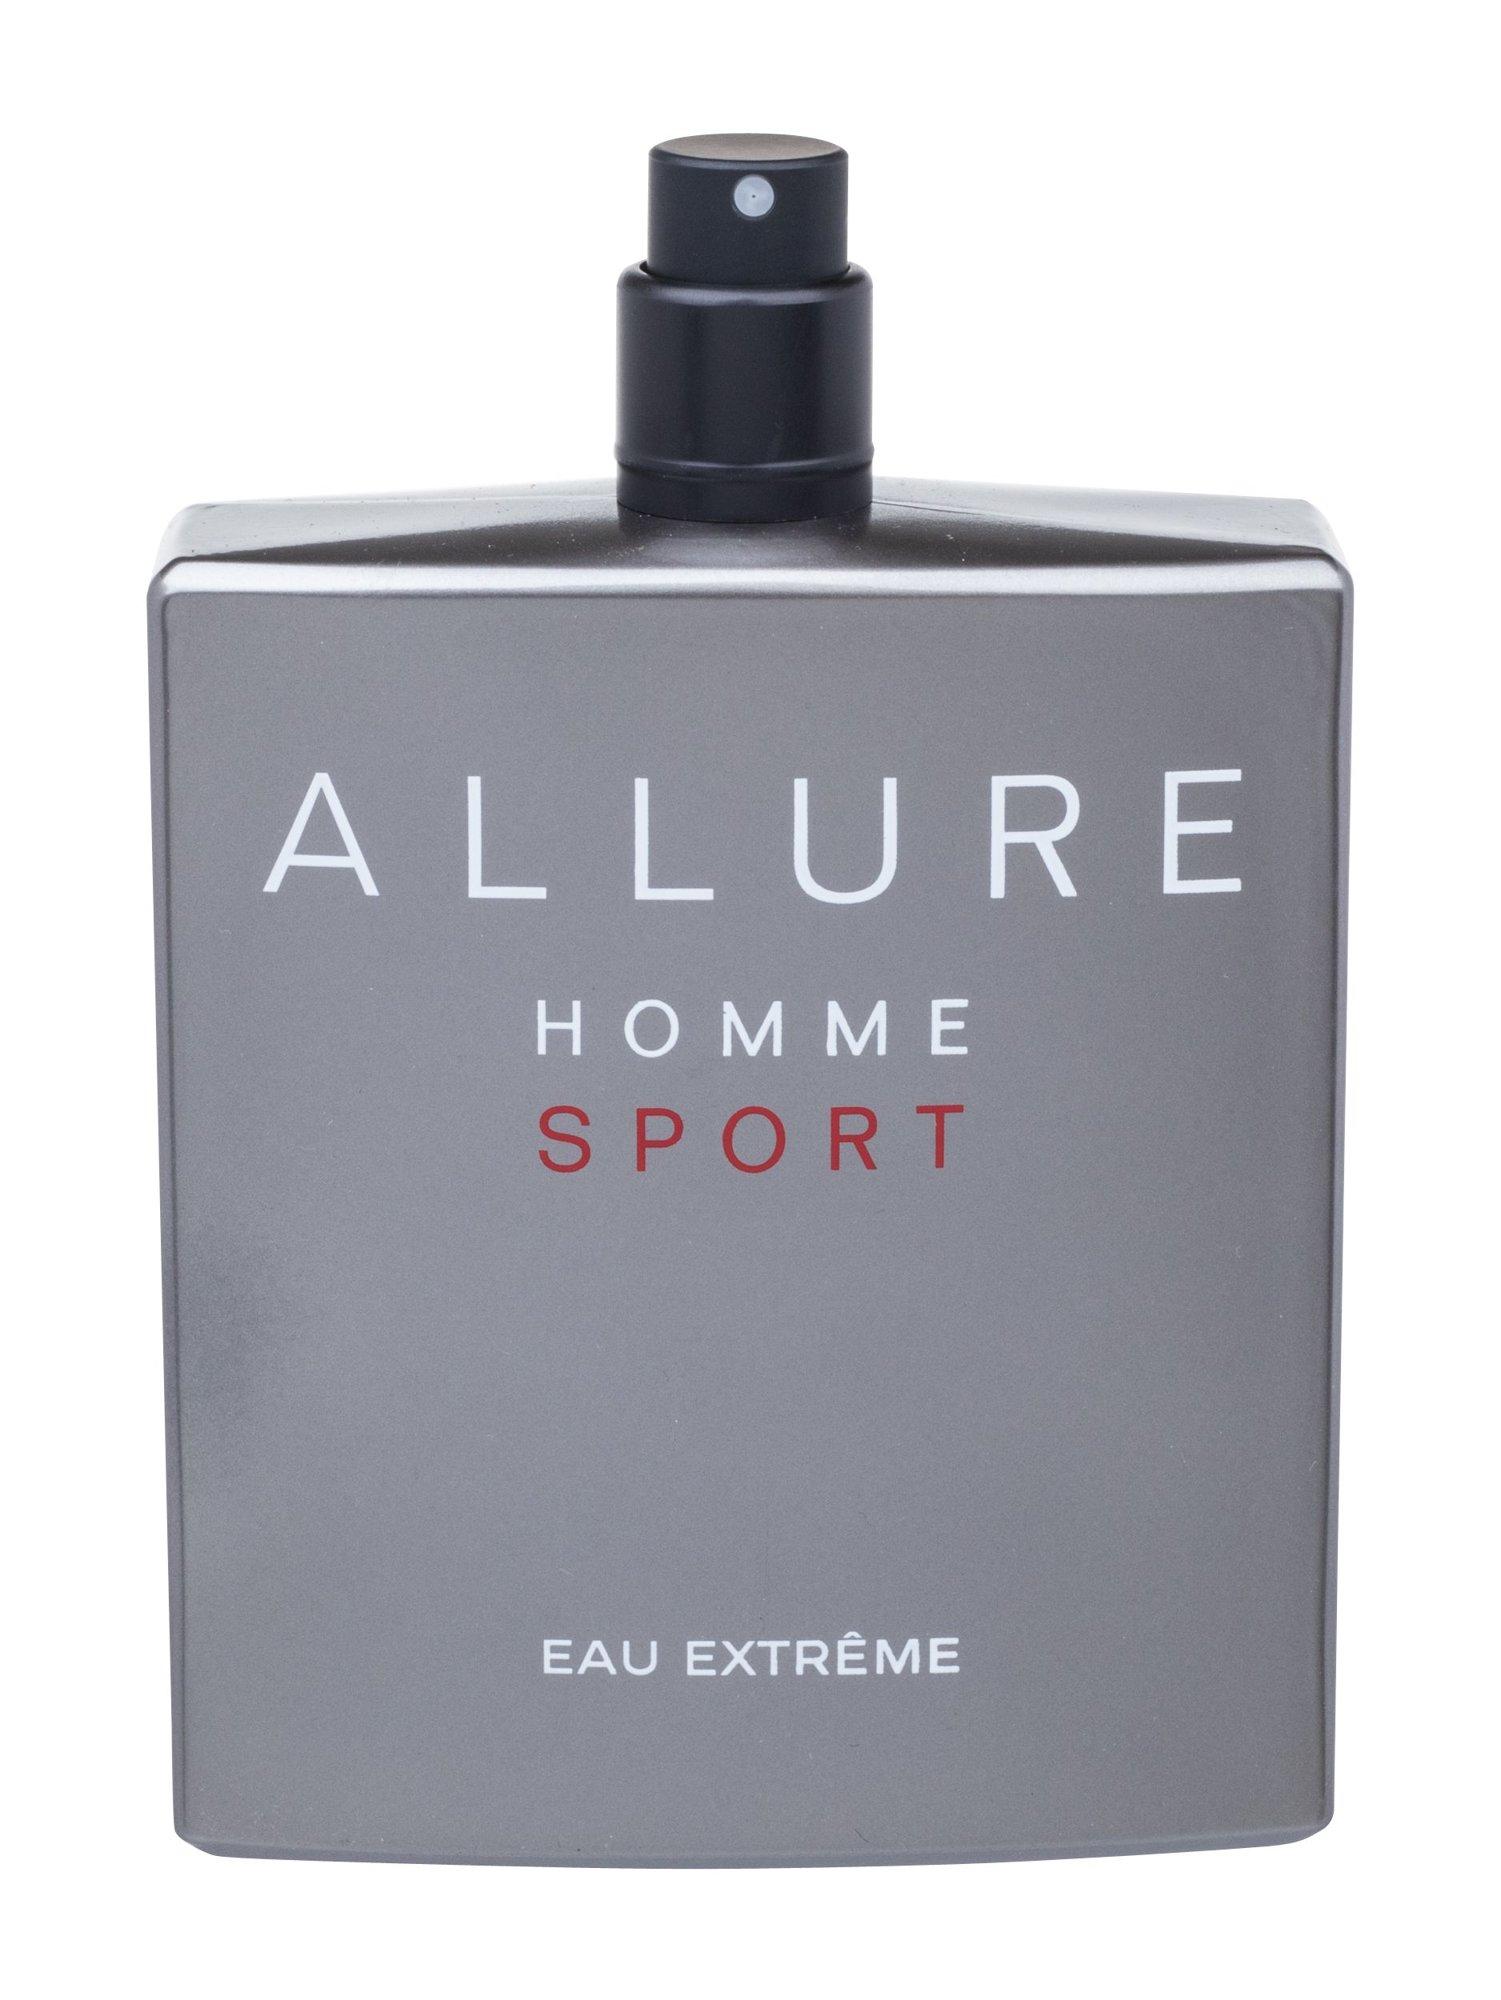 Chanel Allure Homme Sport Eau Extreme EDT 150ml